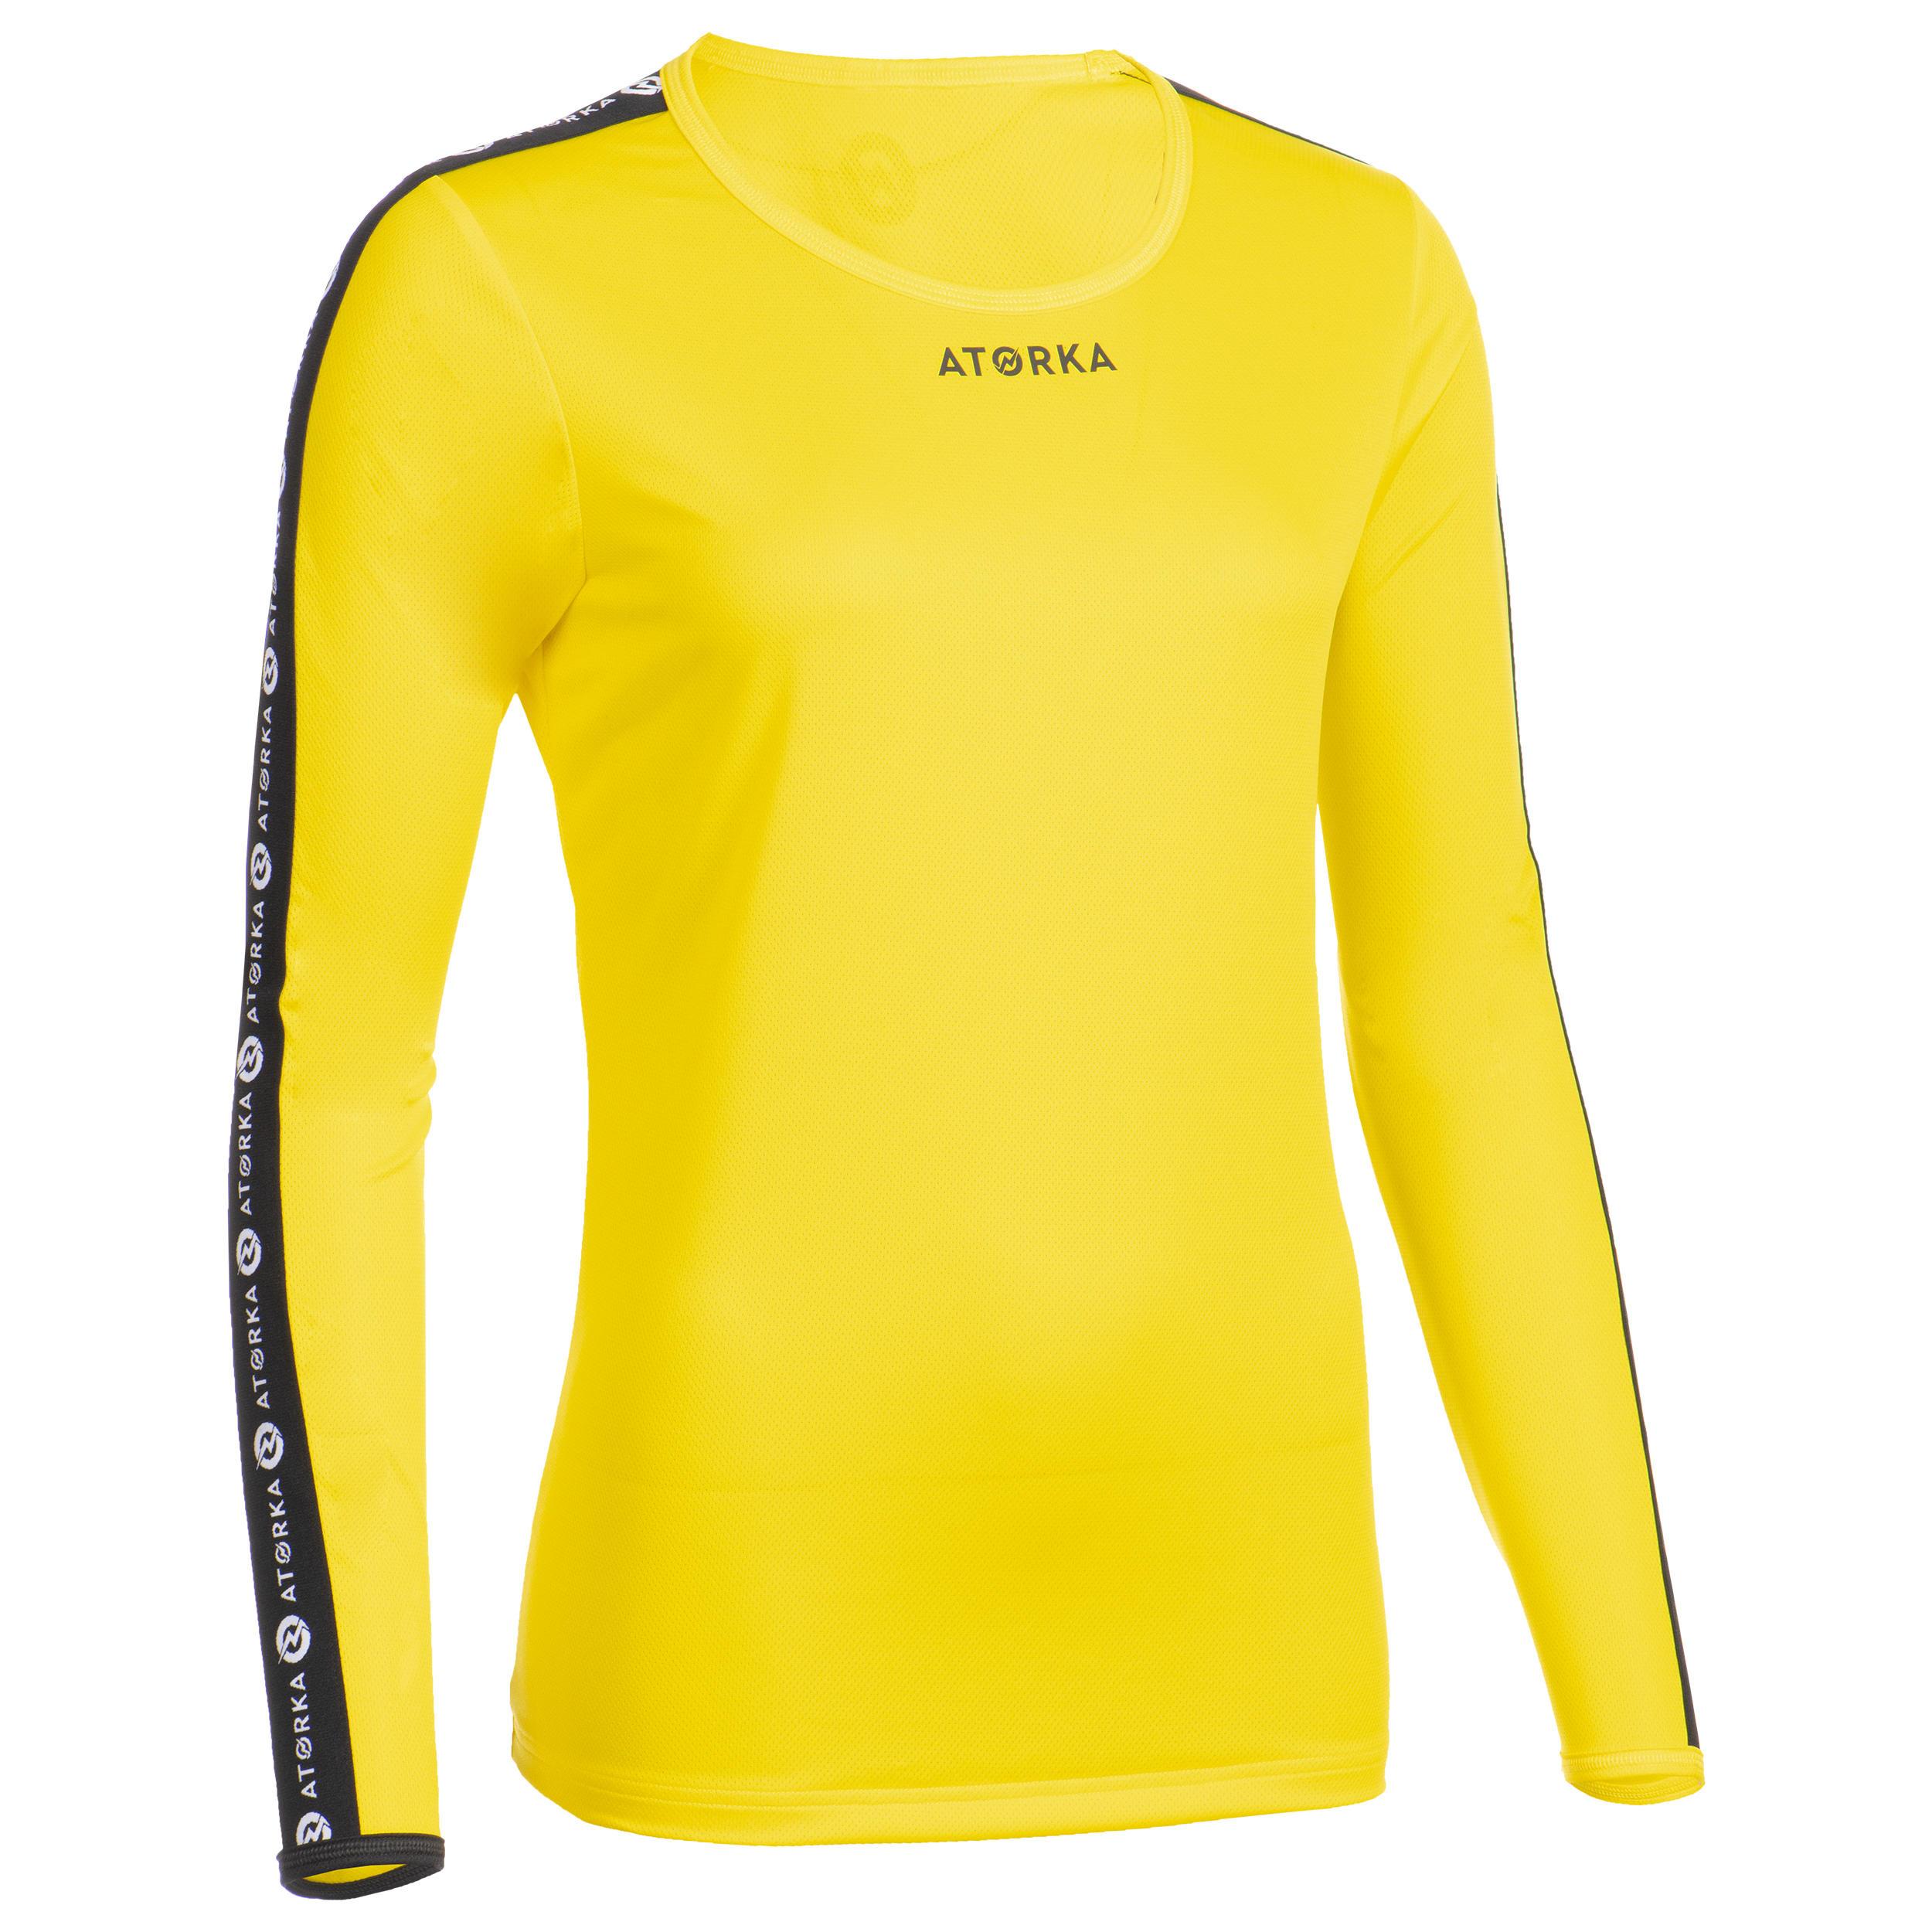 Handballtrikot Langarm H100C Damen | Sportbekleidung | Atorka